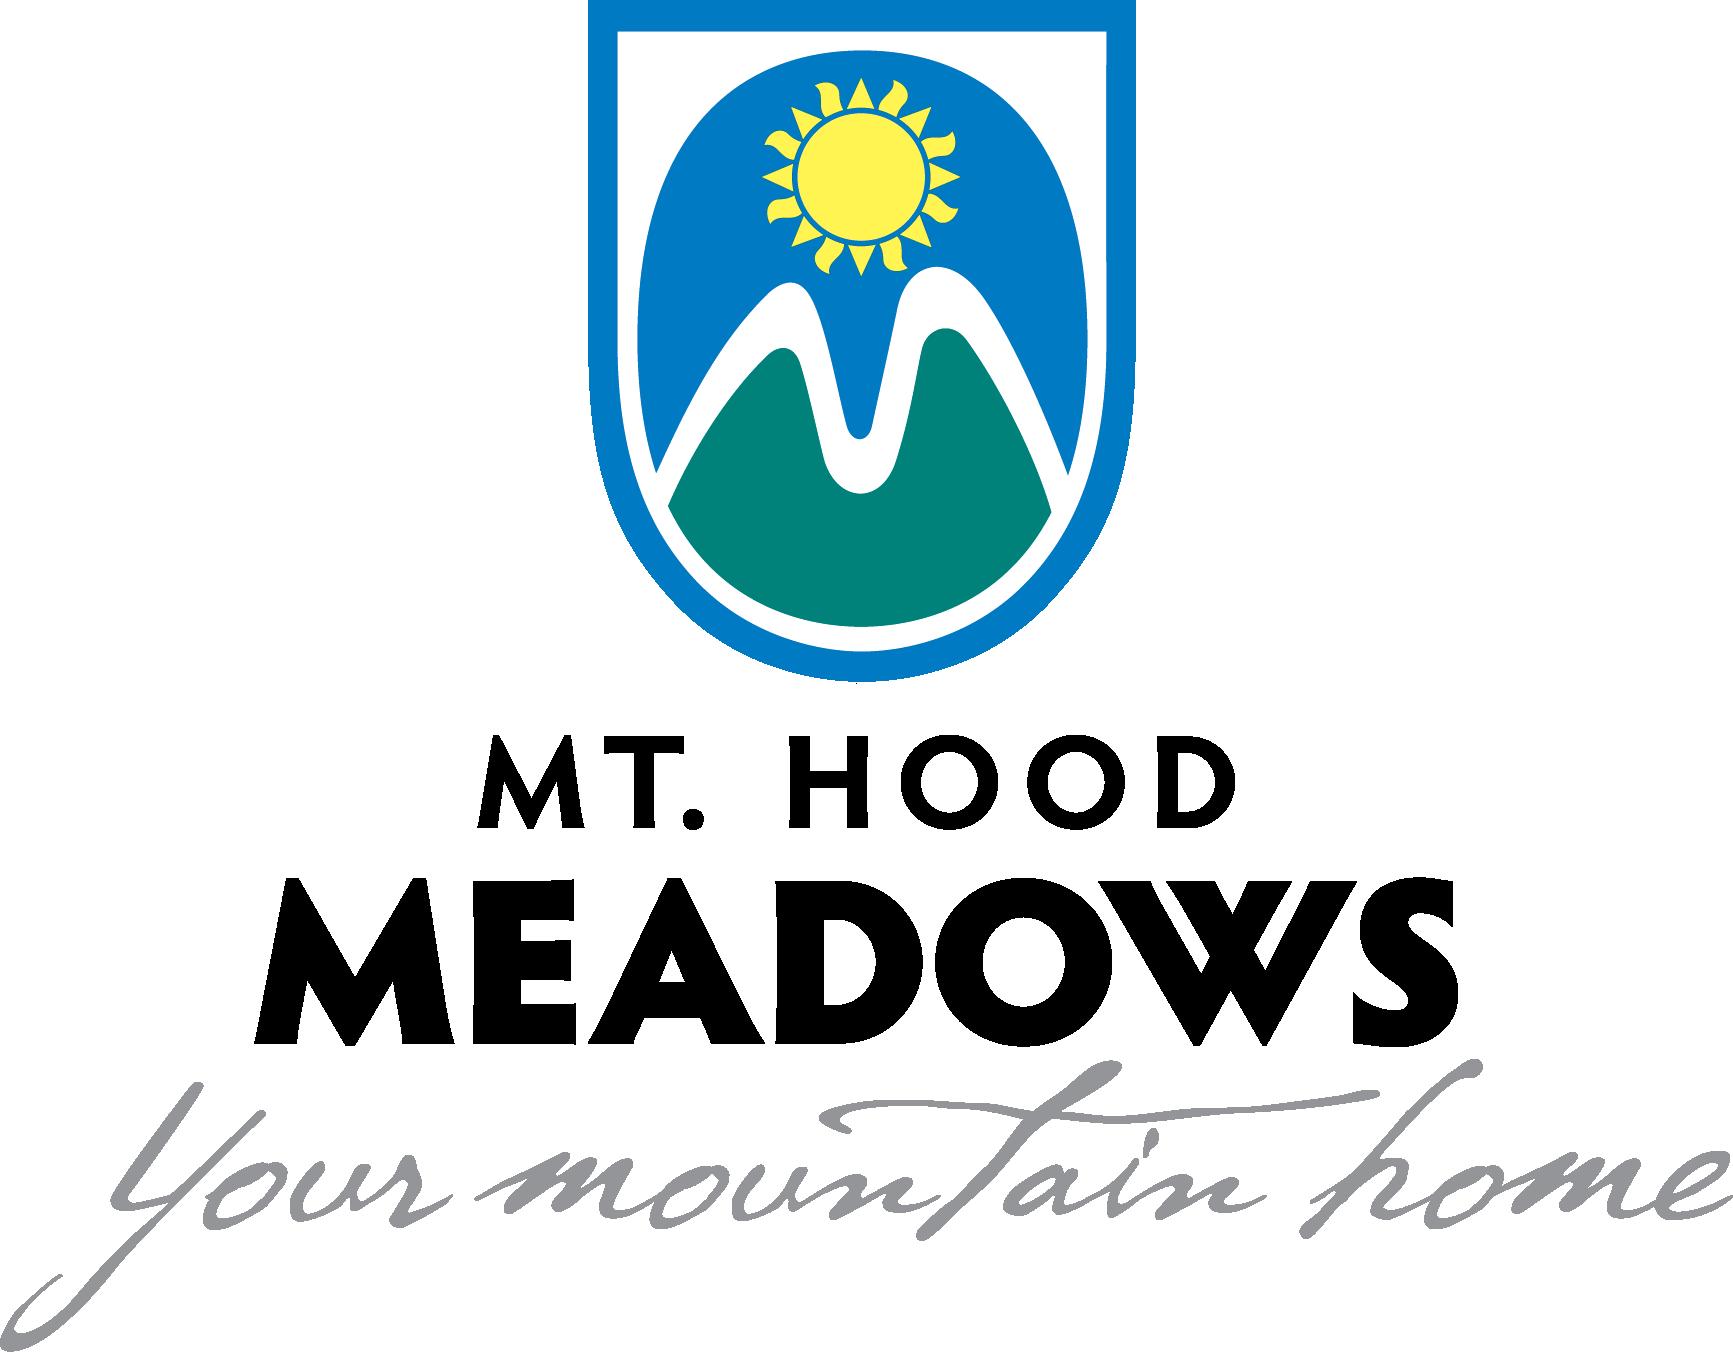 Mt. Hood Meadows logo